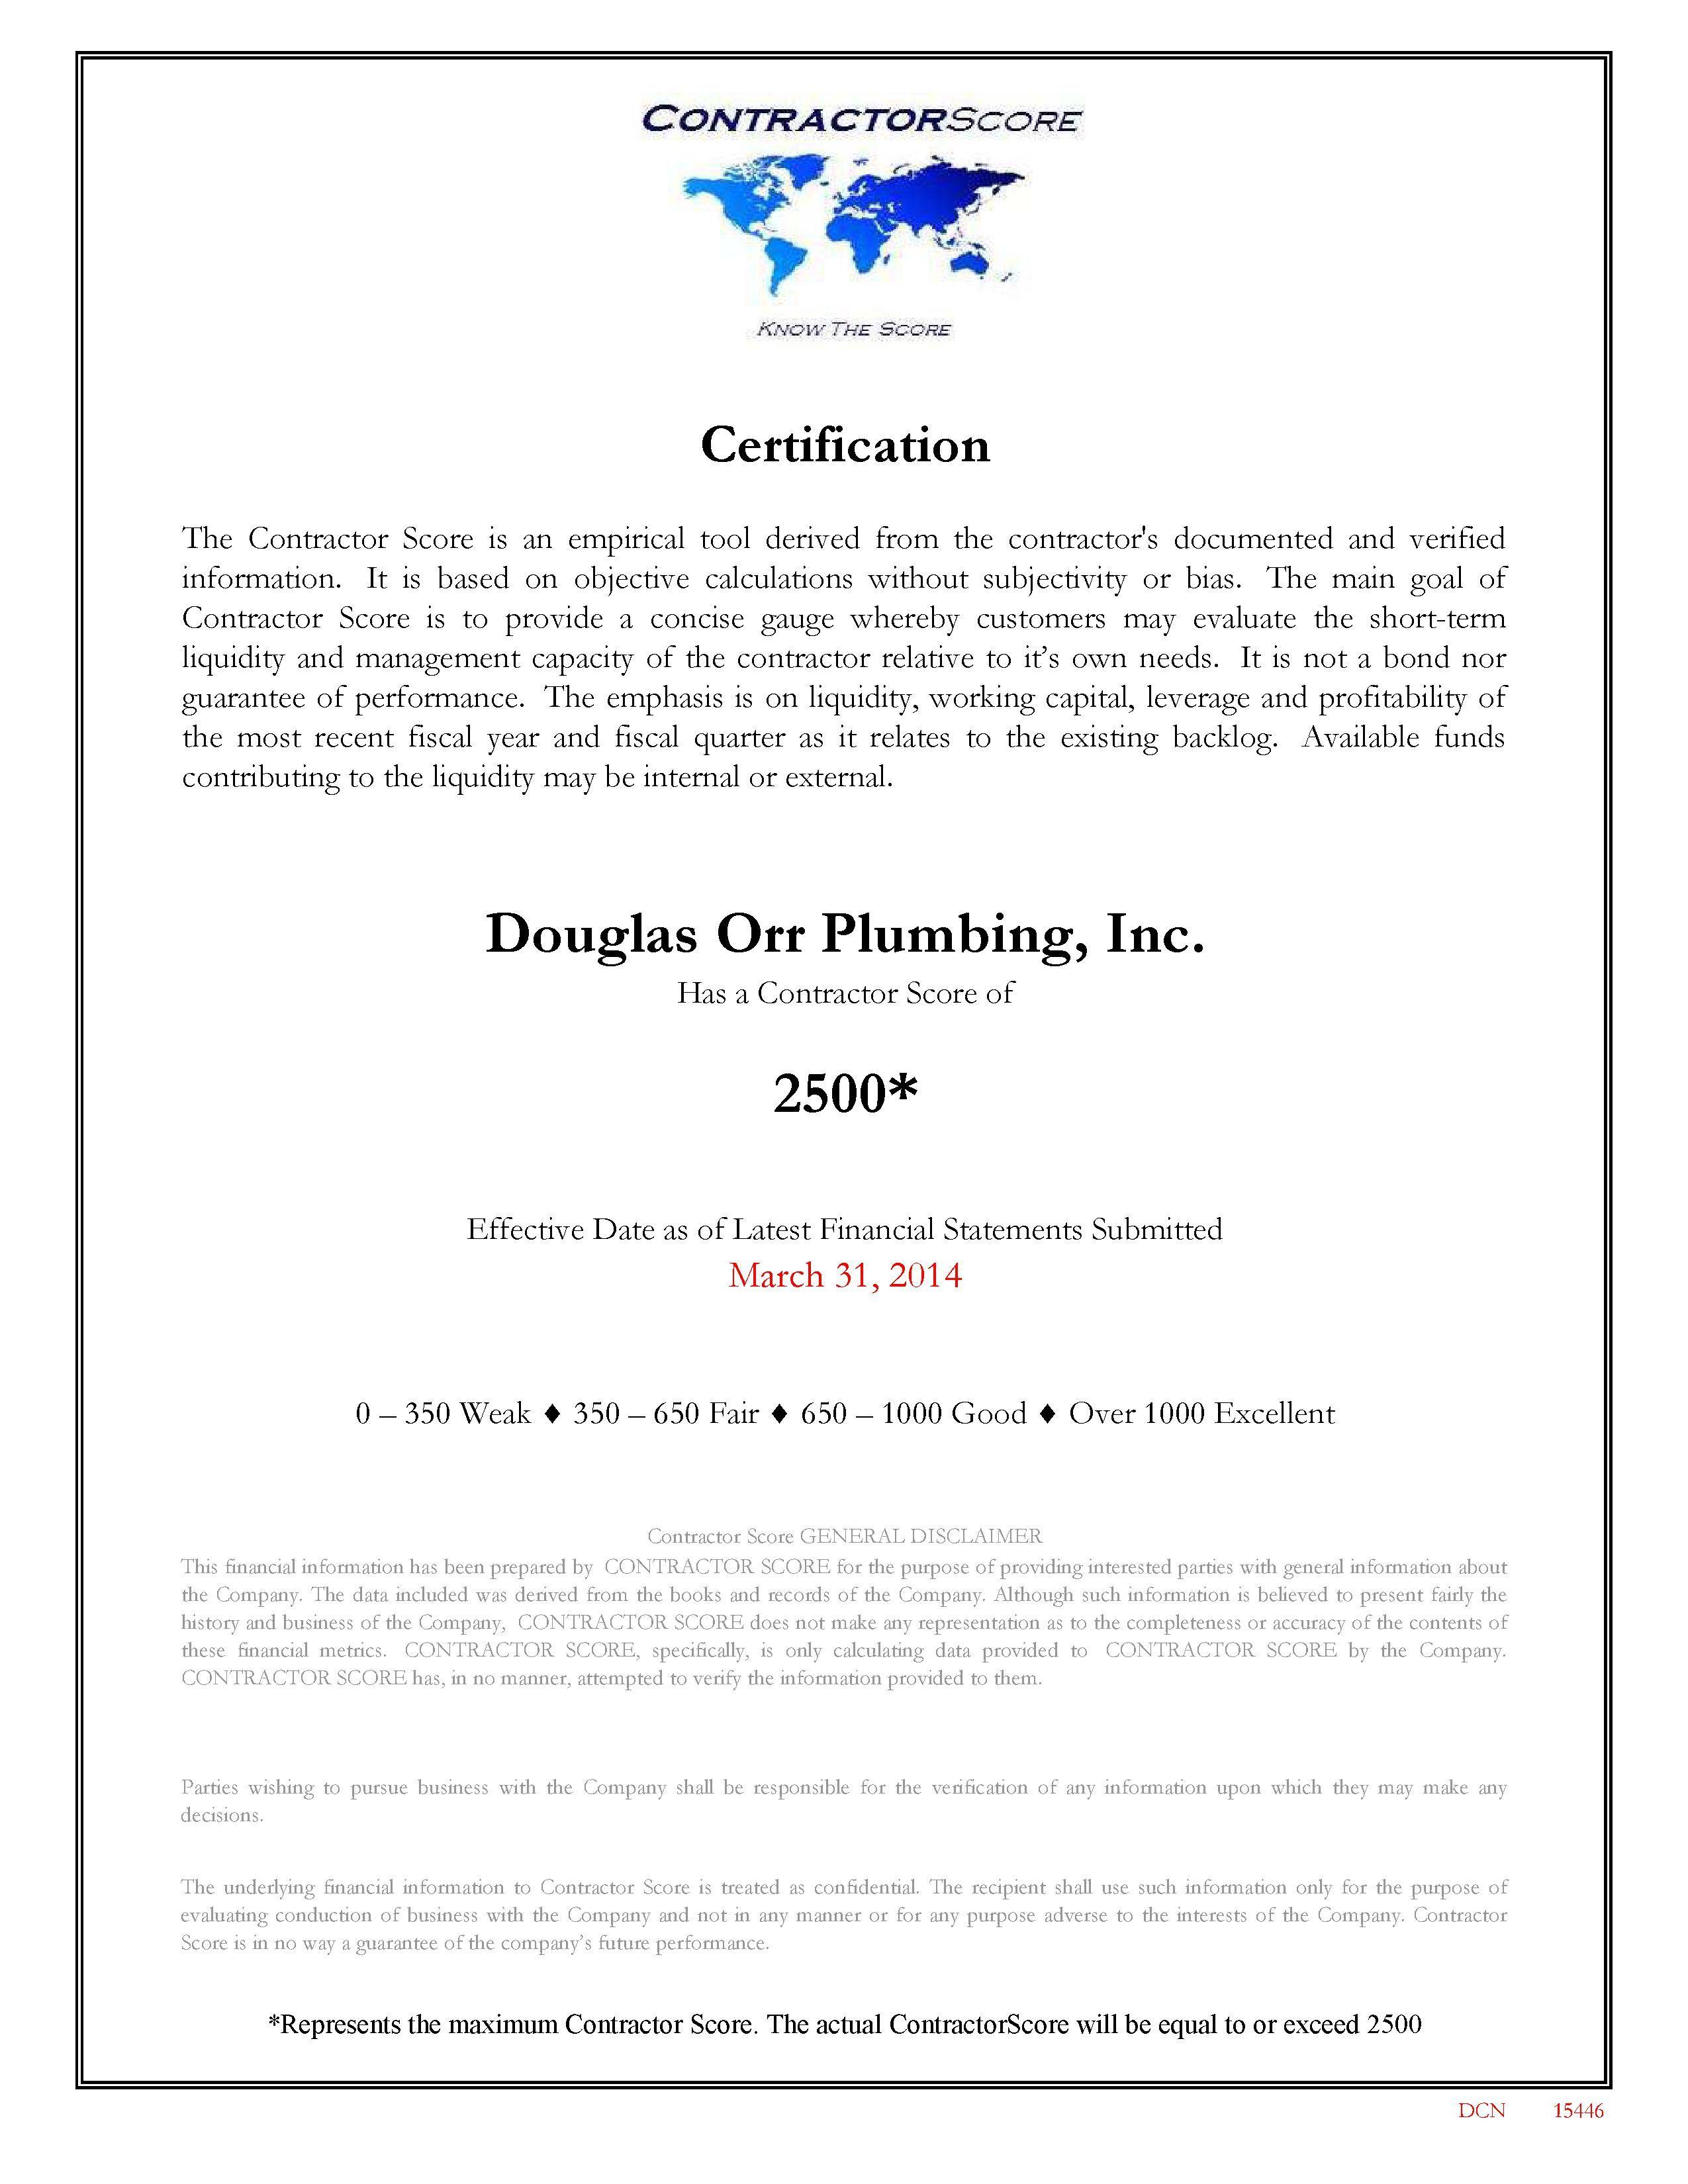 Douglas Orr Plumbing Contractor Review Rating We Aced It Plumbing Contractor Plumbing Contractors